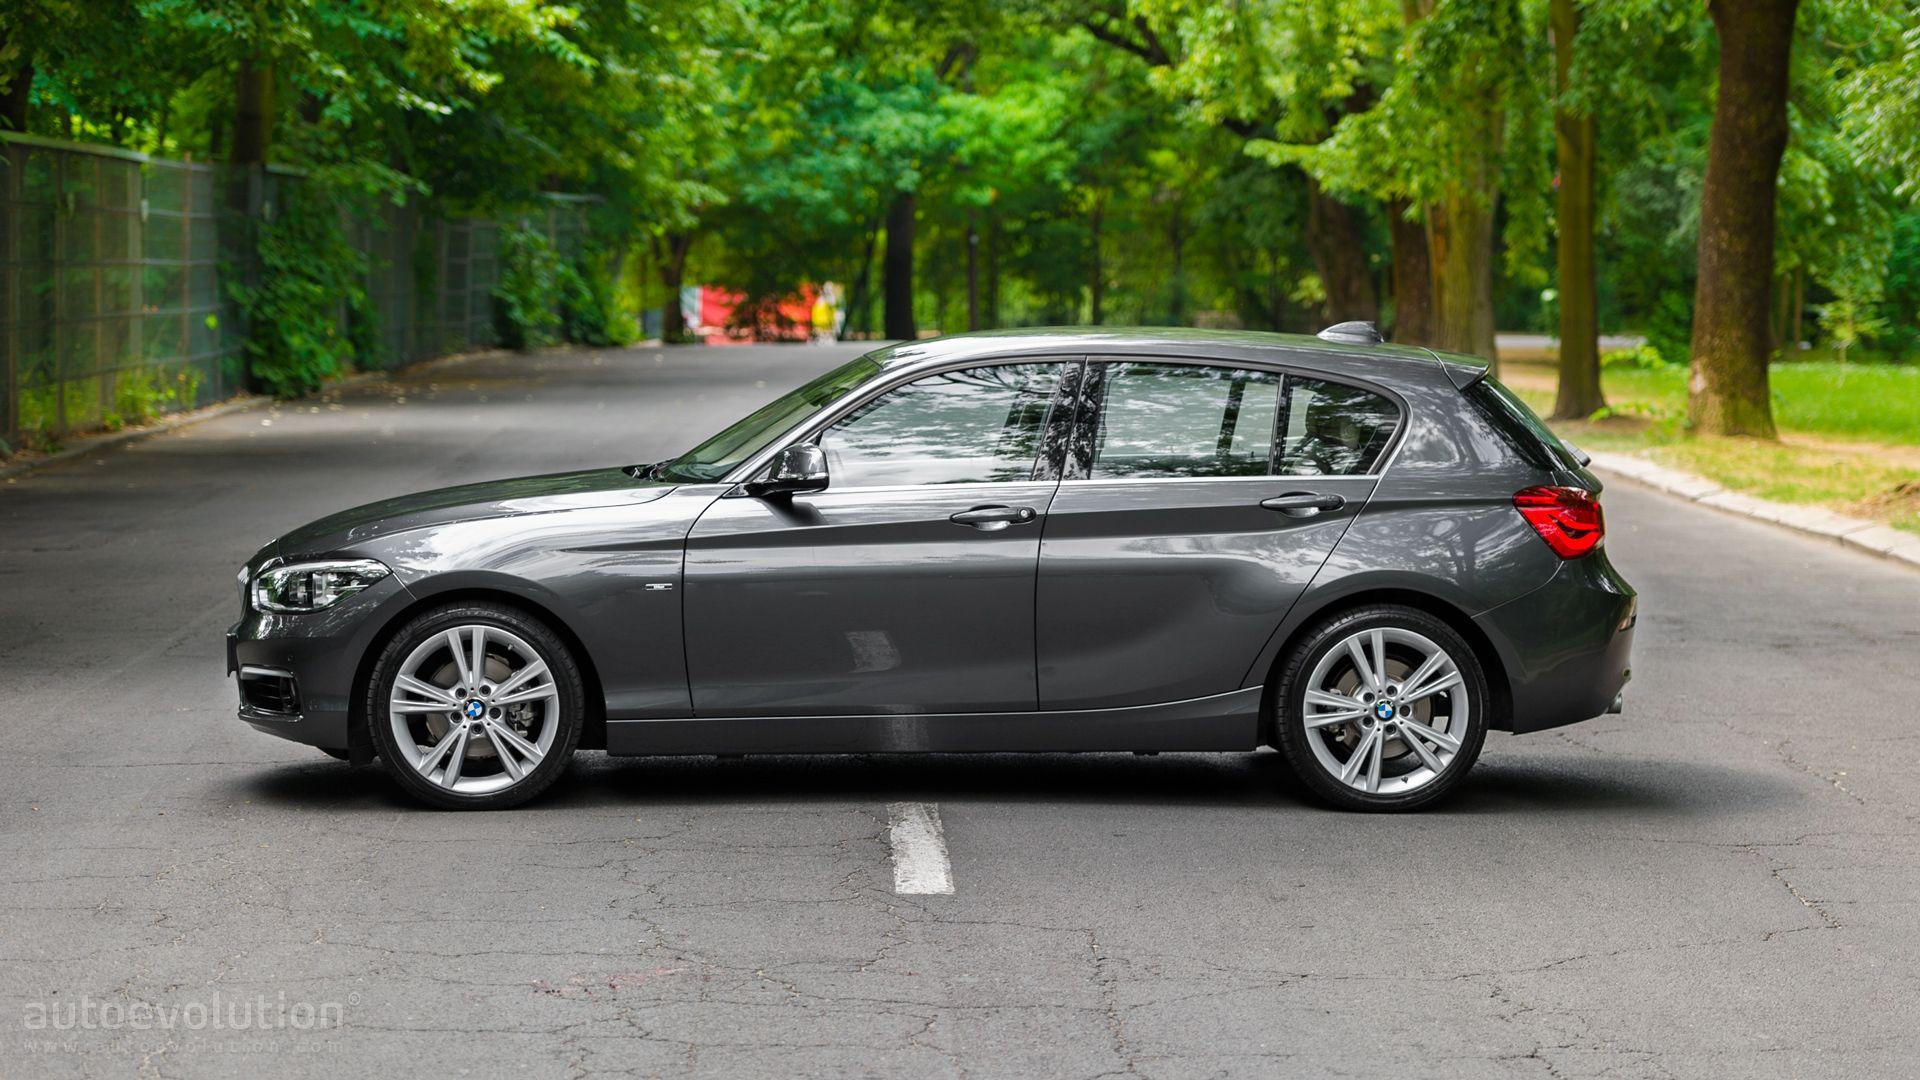 2015 BMW 1 Series Facelift Review - autoevolution